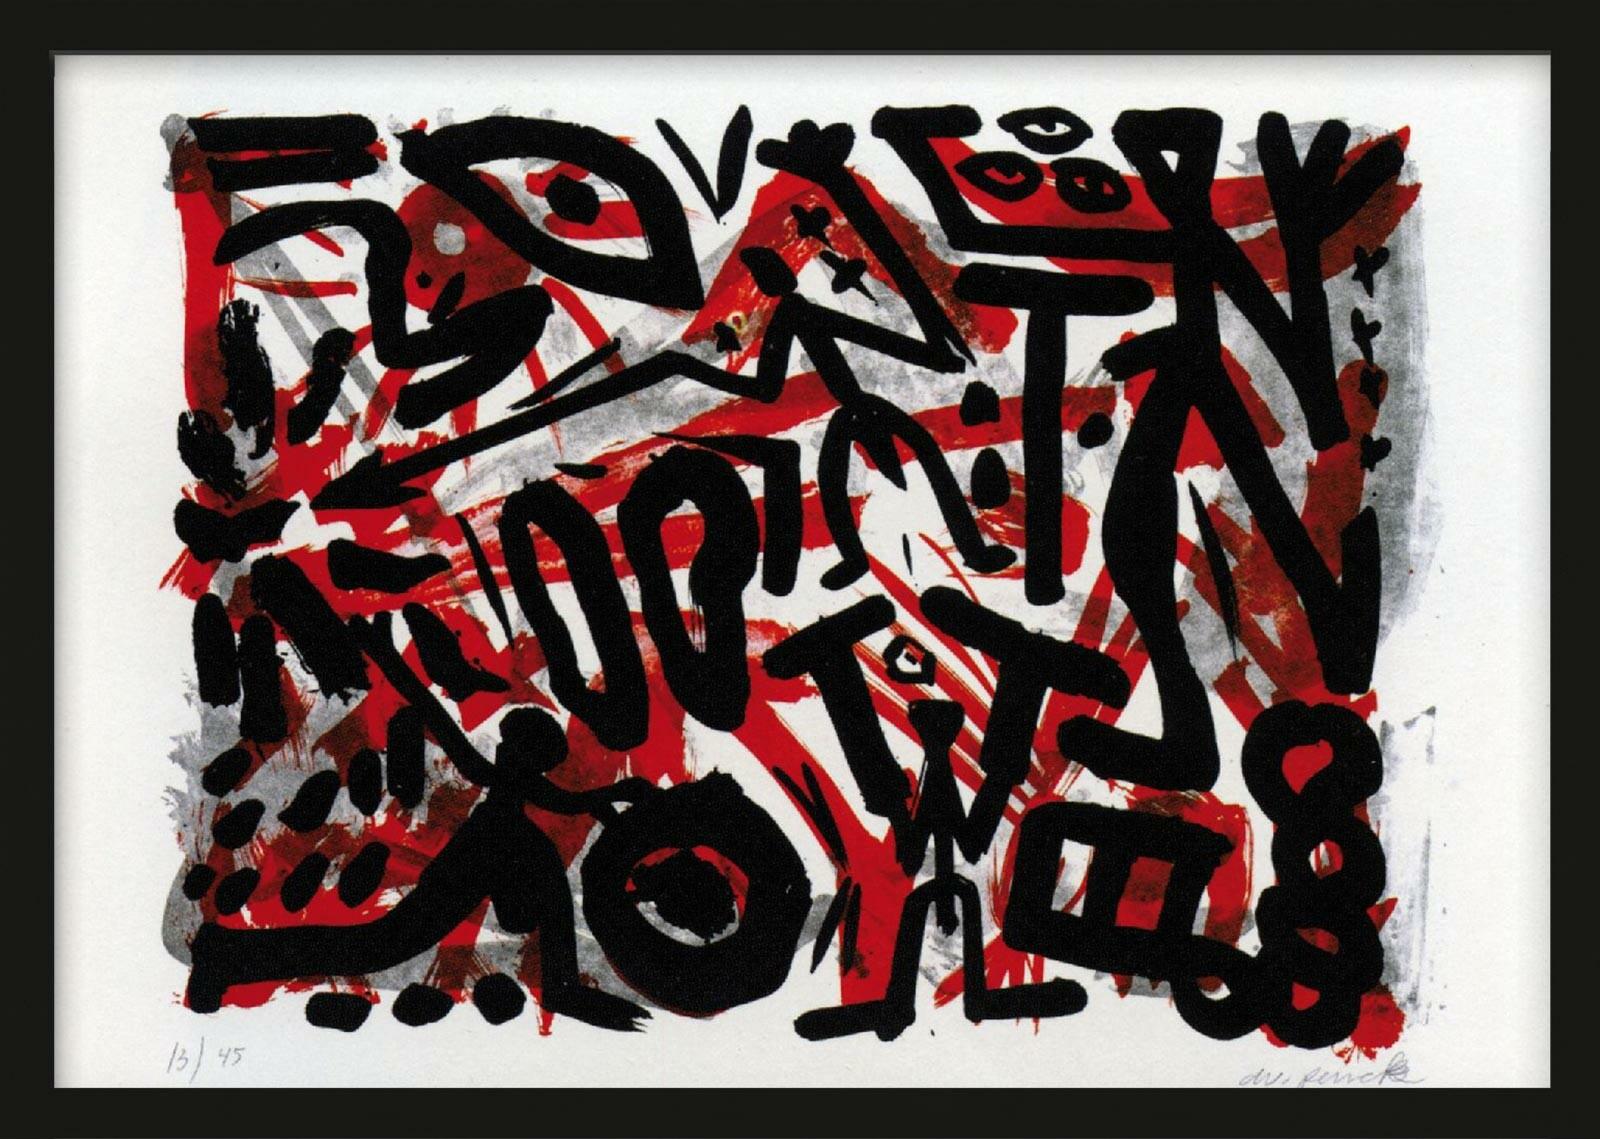 Theorie und Praxis - A.r. Penck